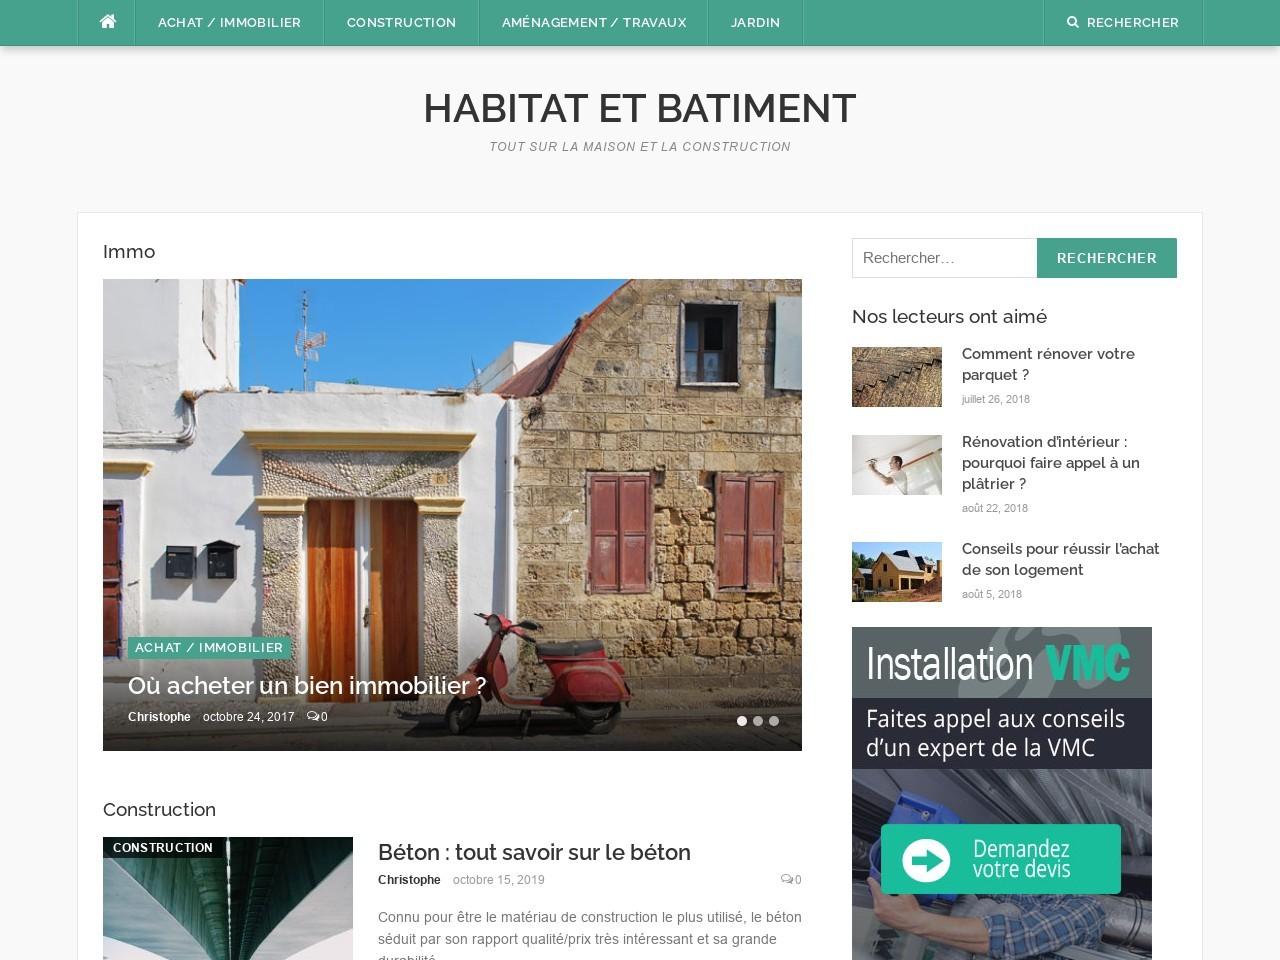 habitatetbatiment.fr